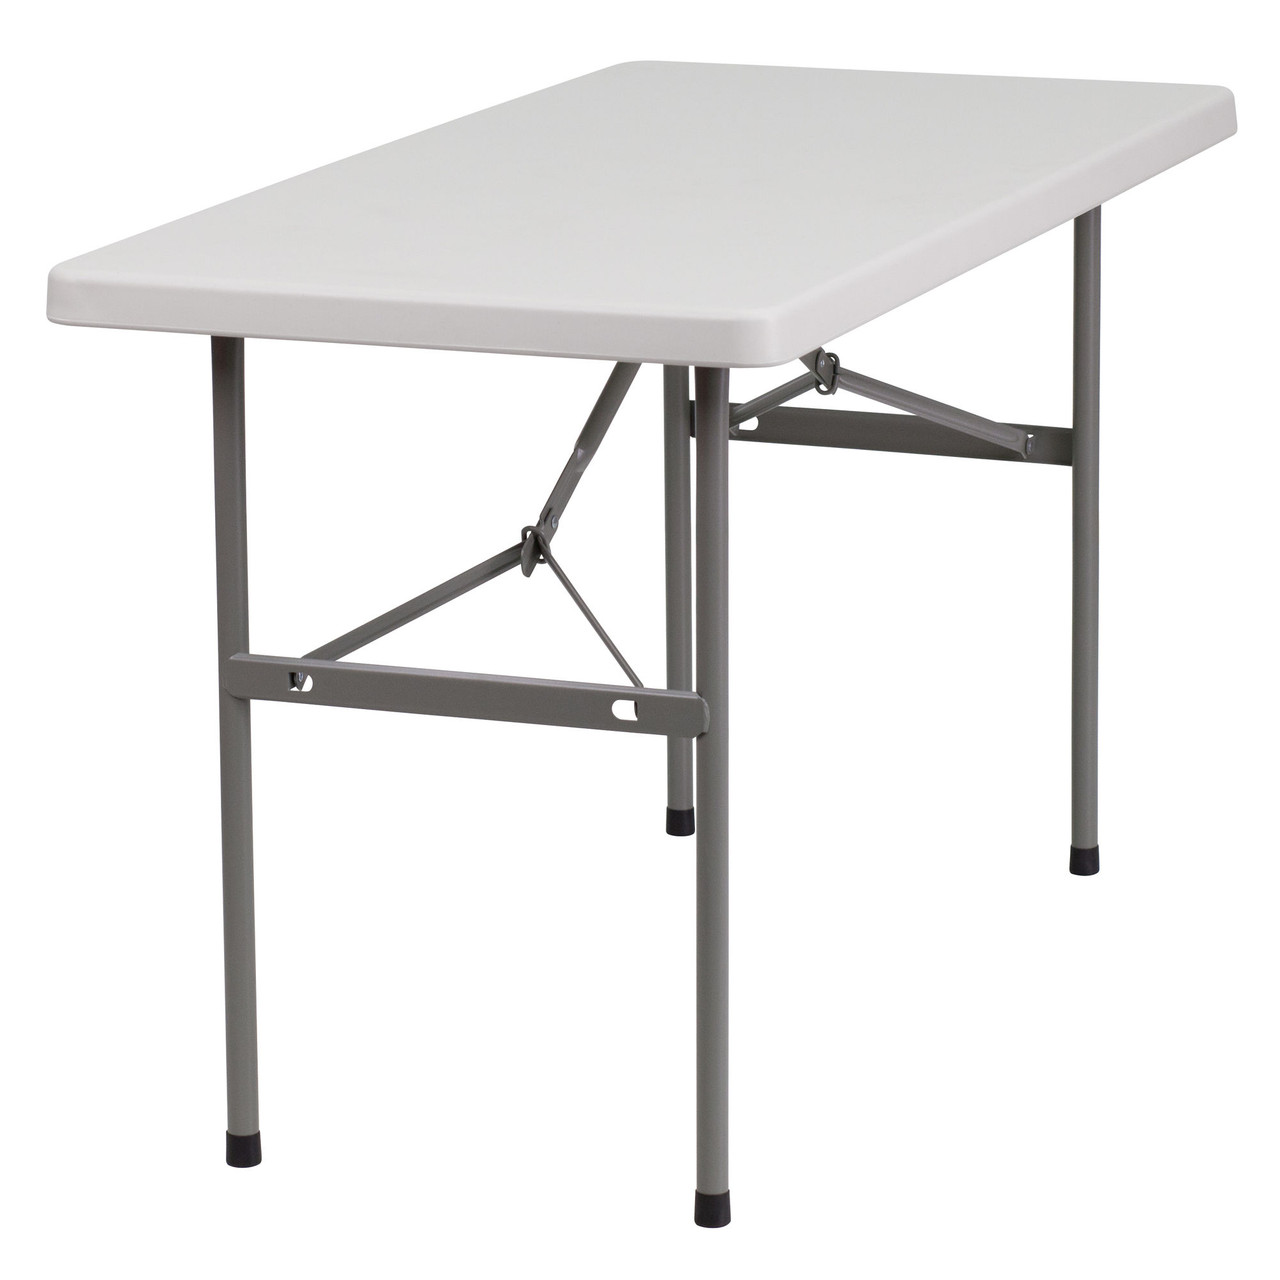 - 4 Ft Lightweight Plastic Folding Table [RB-2448-GG